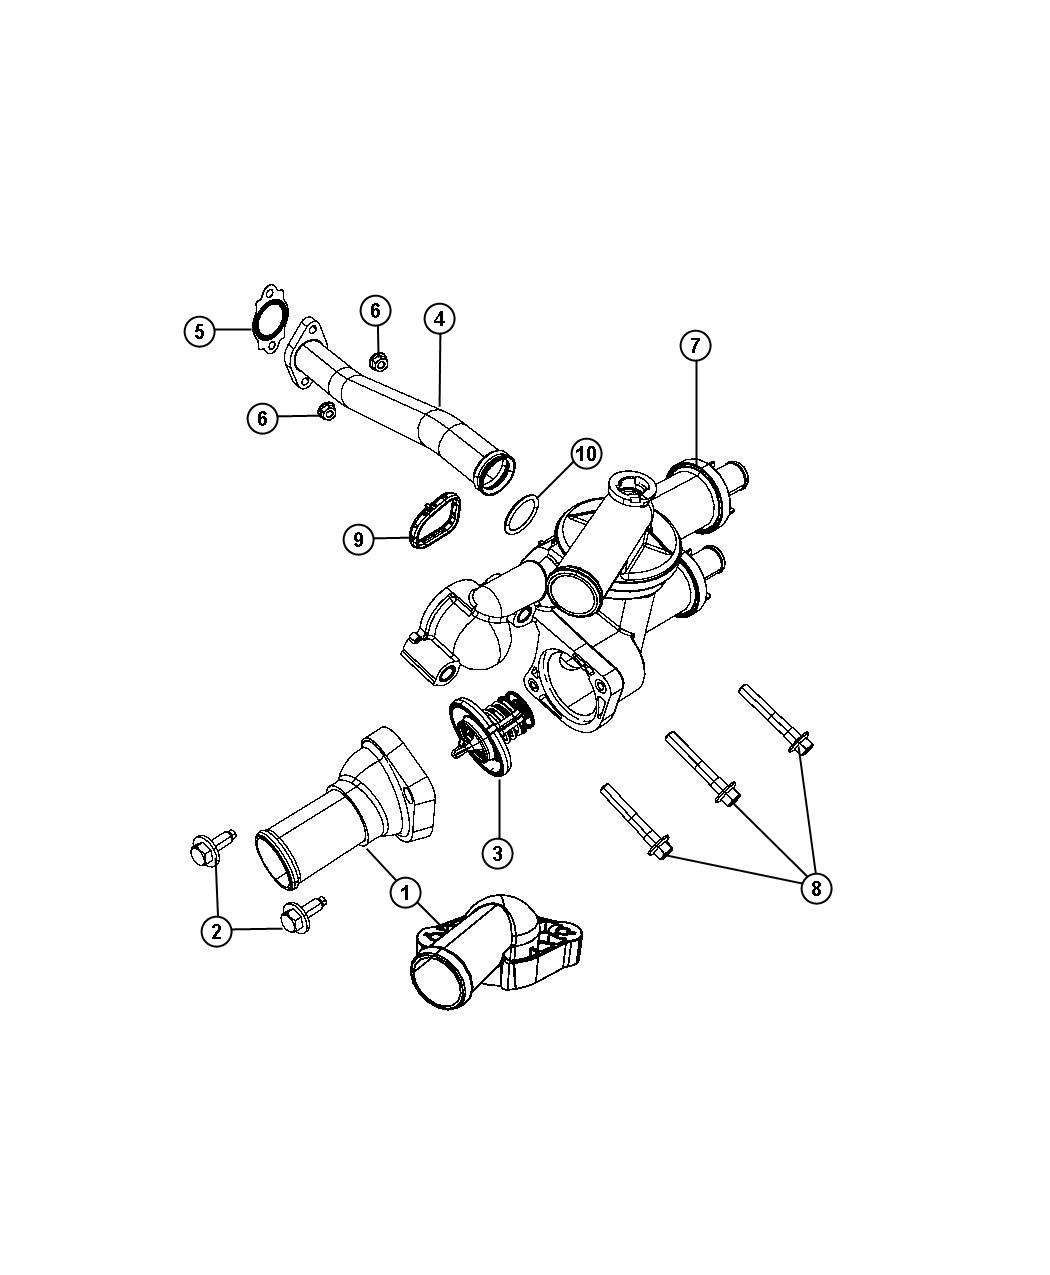 2012 Dodge Avenger Adapter package. Coolant. After [10-17